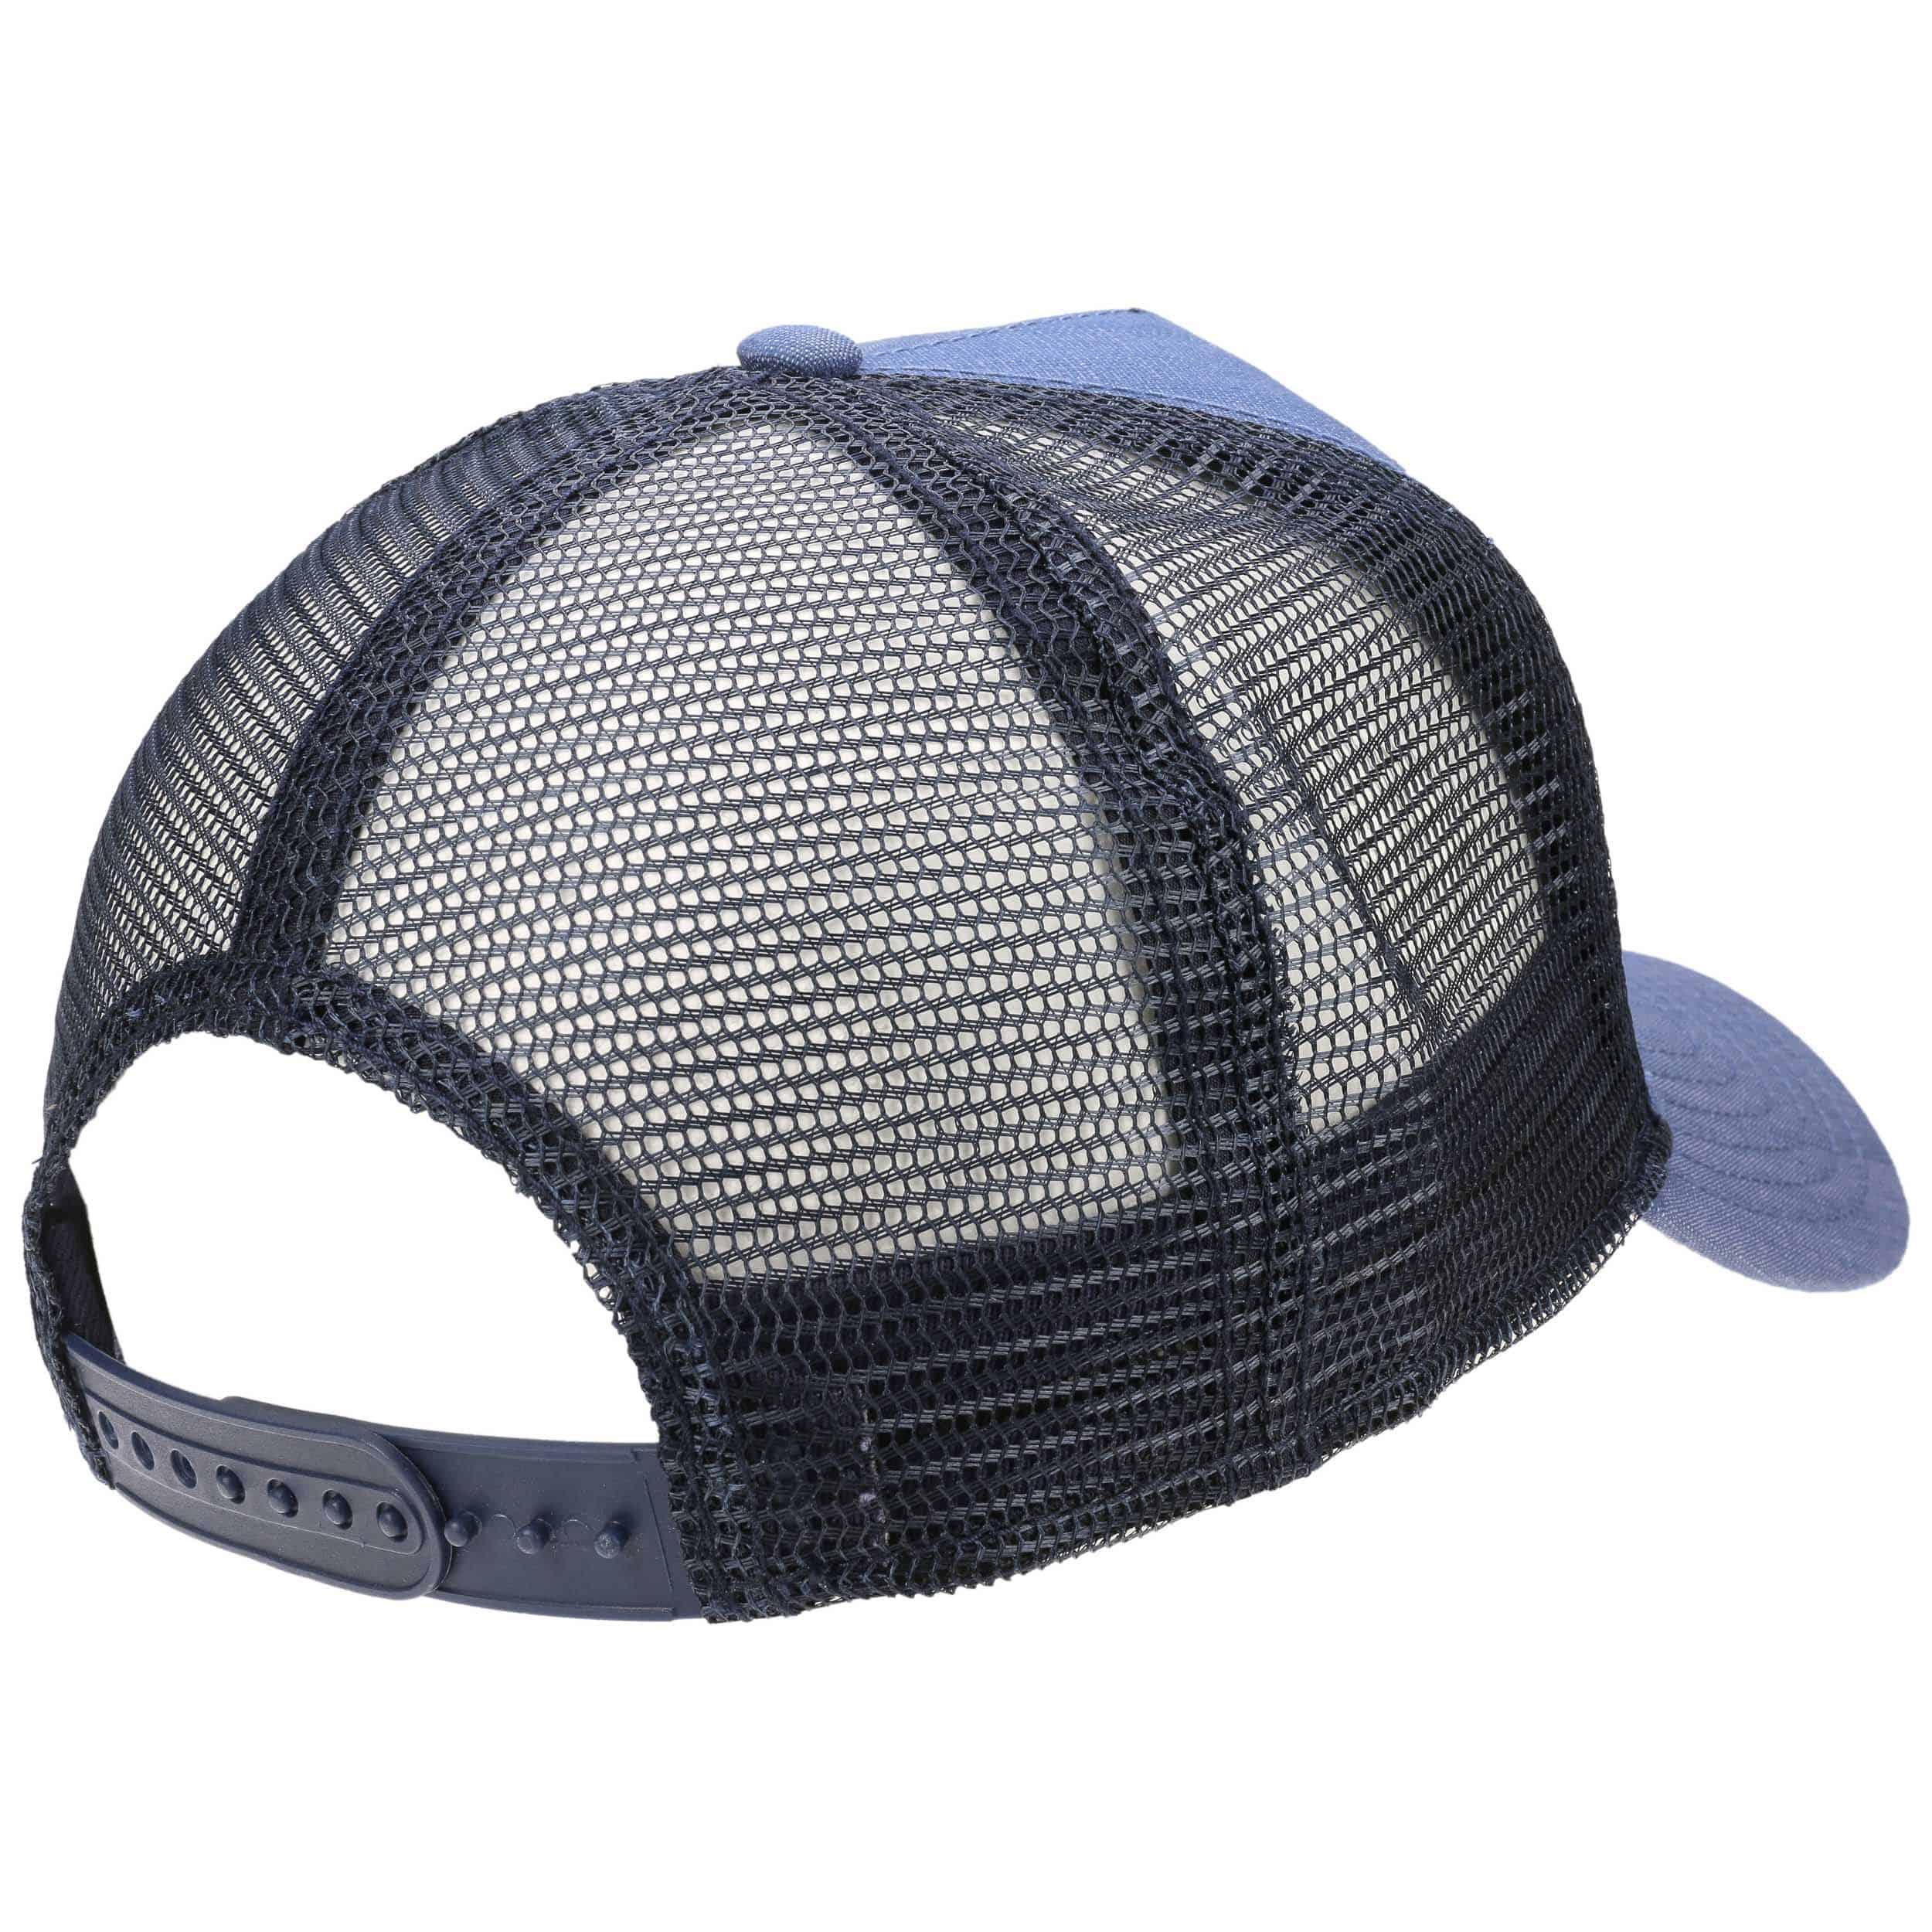 DJINNS Coloured Linen Trucker Cap Basecap Baseballcap Meshcap Snapback